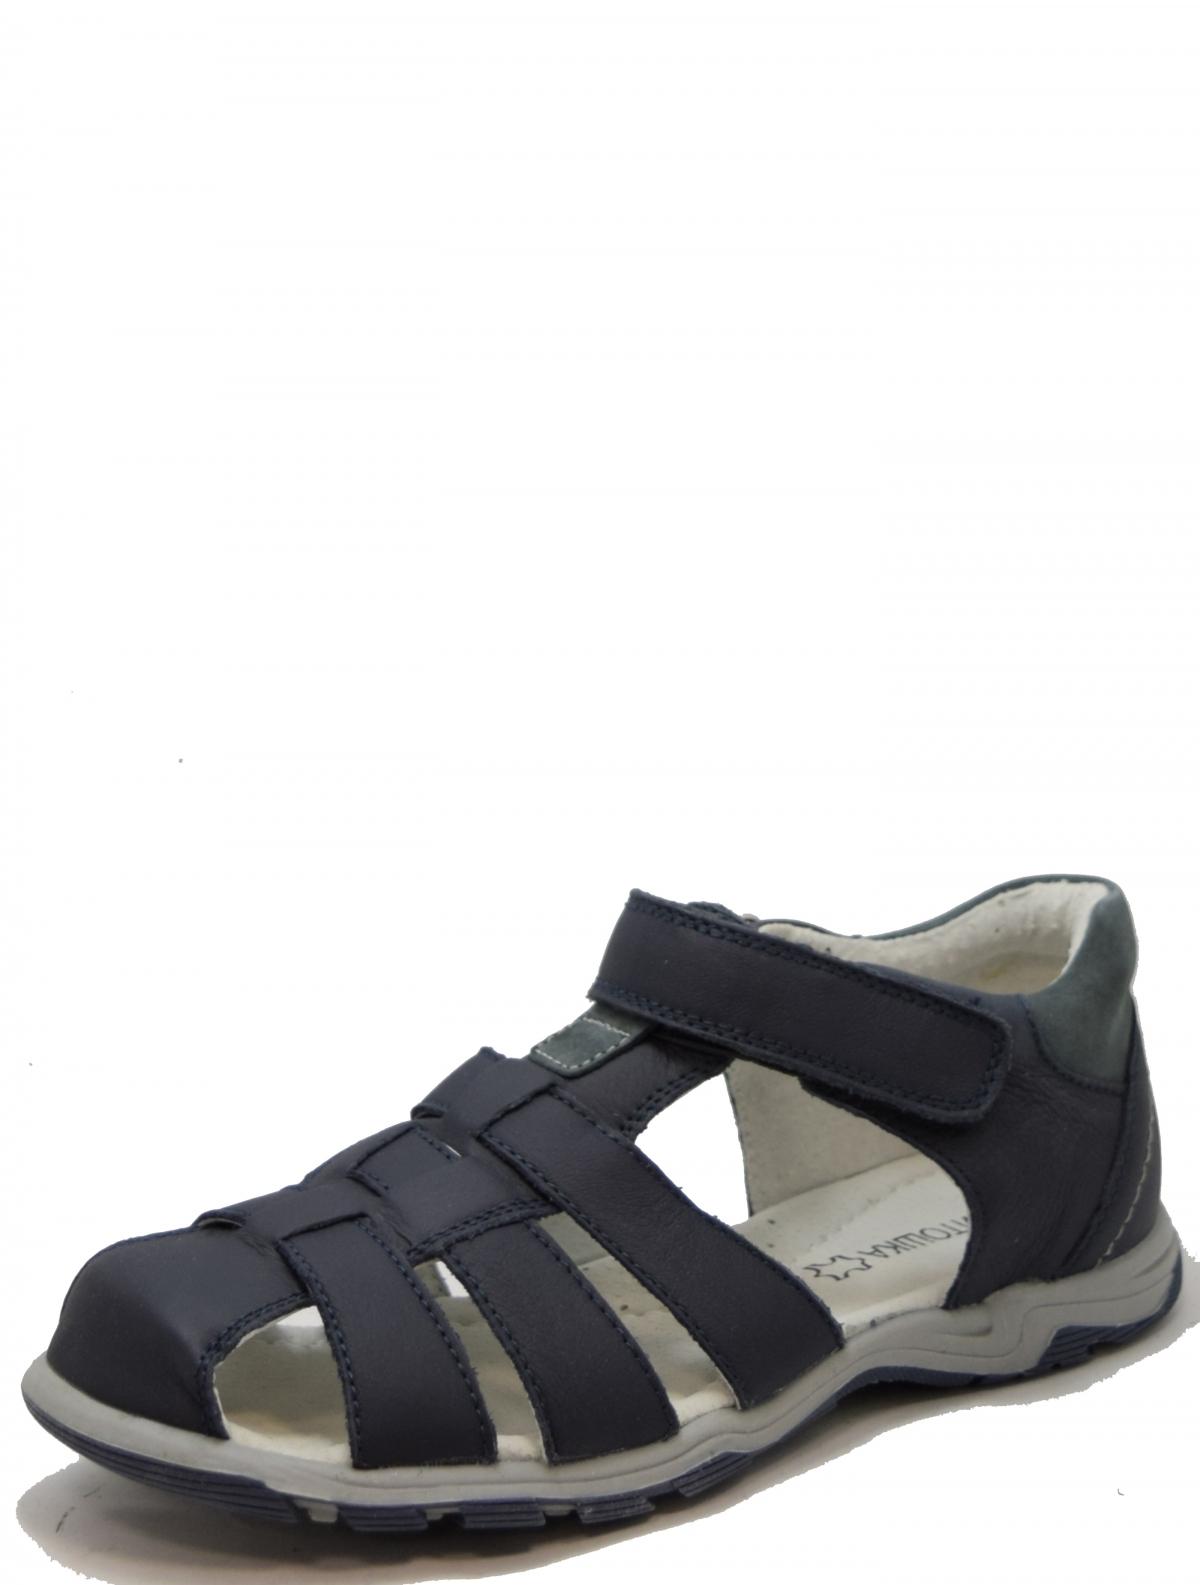 Капитошка A10044 сандали для мальчика